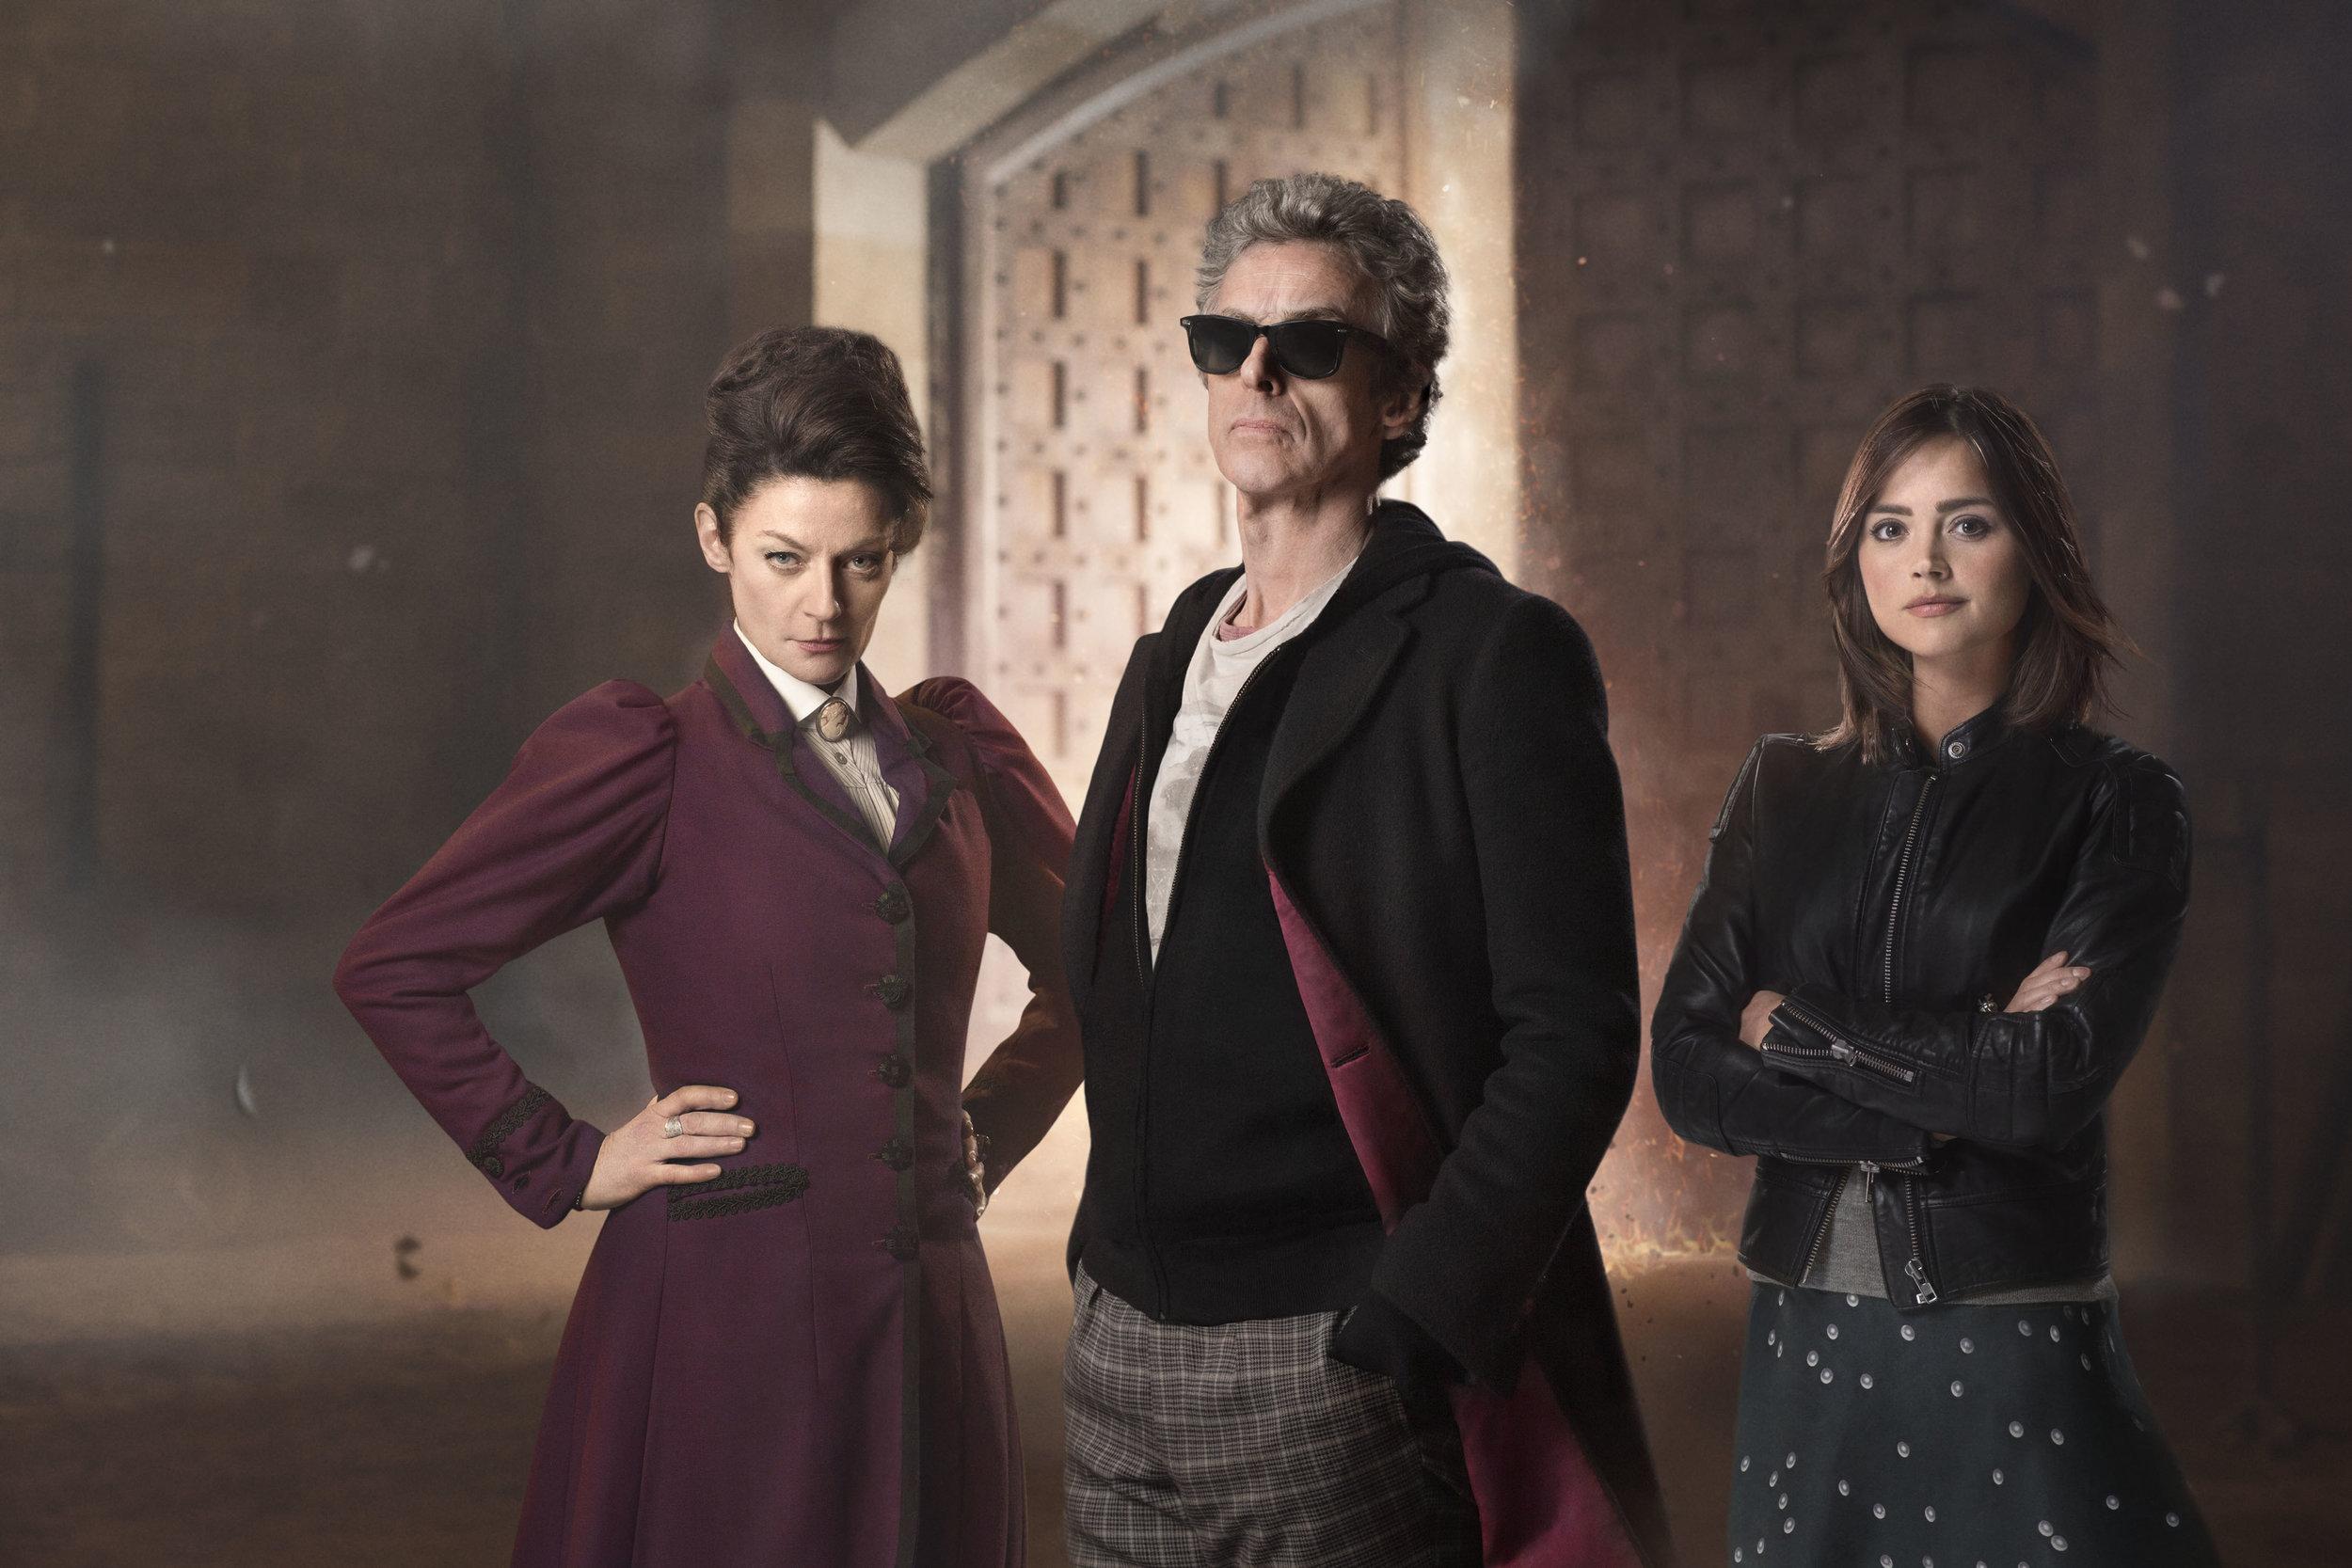 Doctor Who © BBC/Simon Ridgway